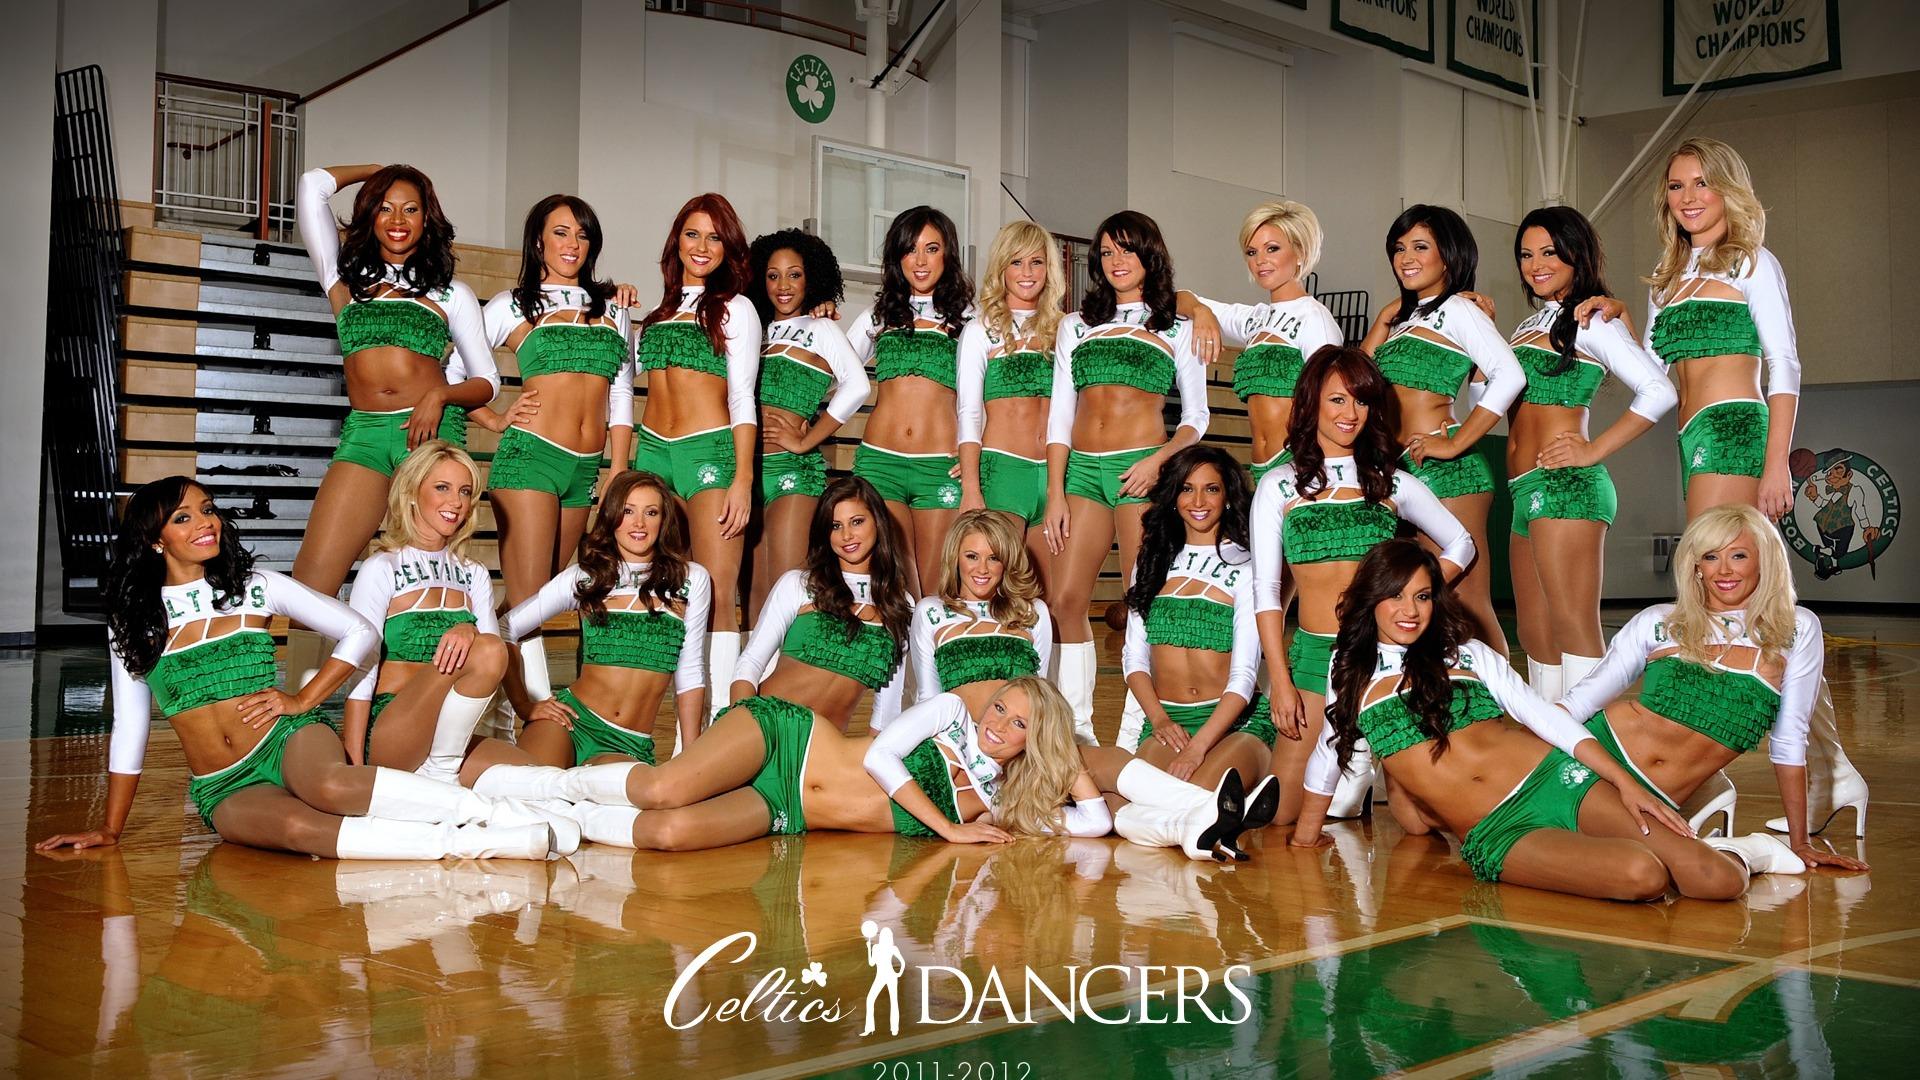 Boston Celtics 2011-2012 season beautiful Dancers Wallpapers Preview | 10wallpaper.com